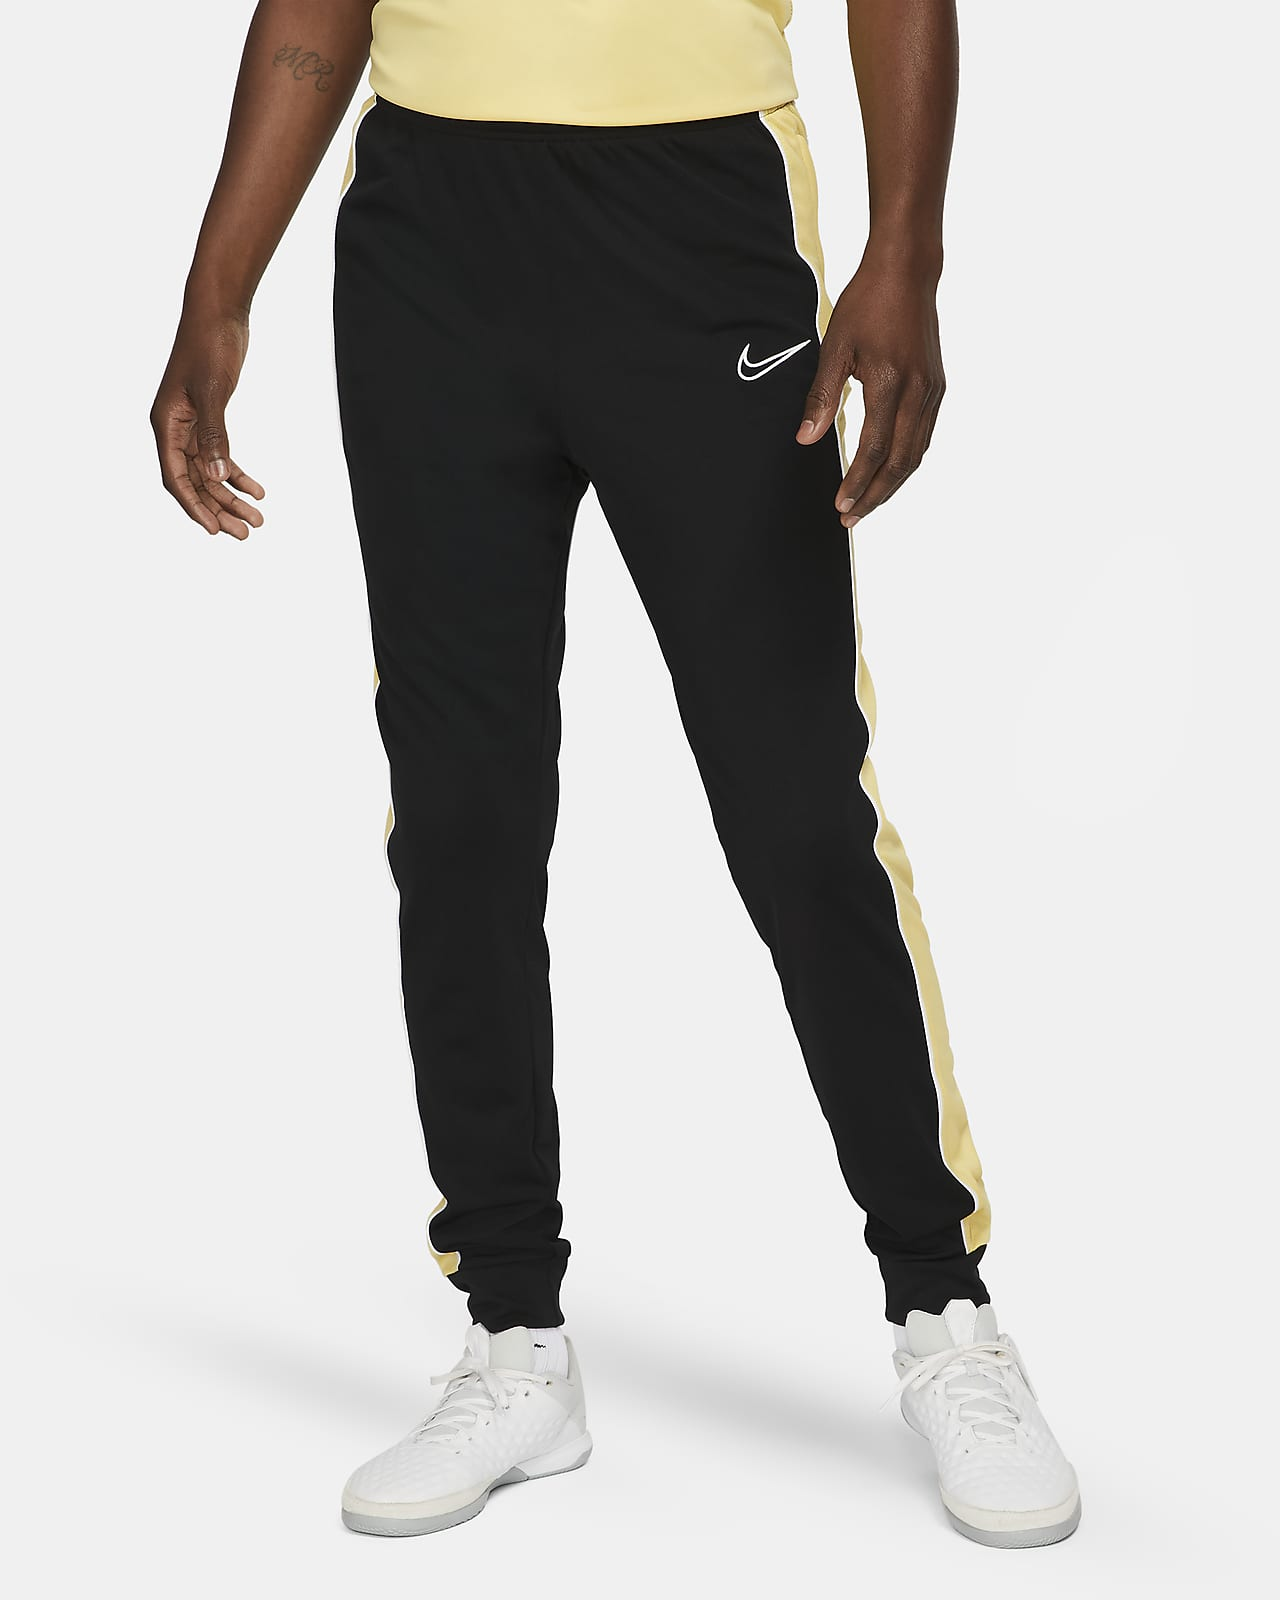 Nike Dri-FIT Academy Men's Knit Football Tracksuit Bottoms